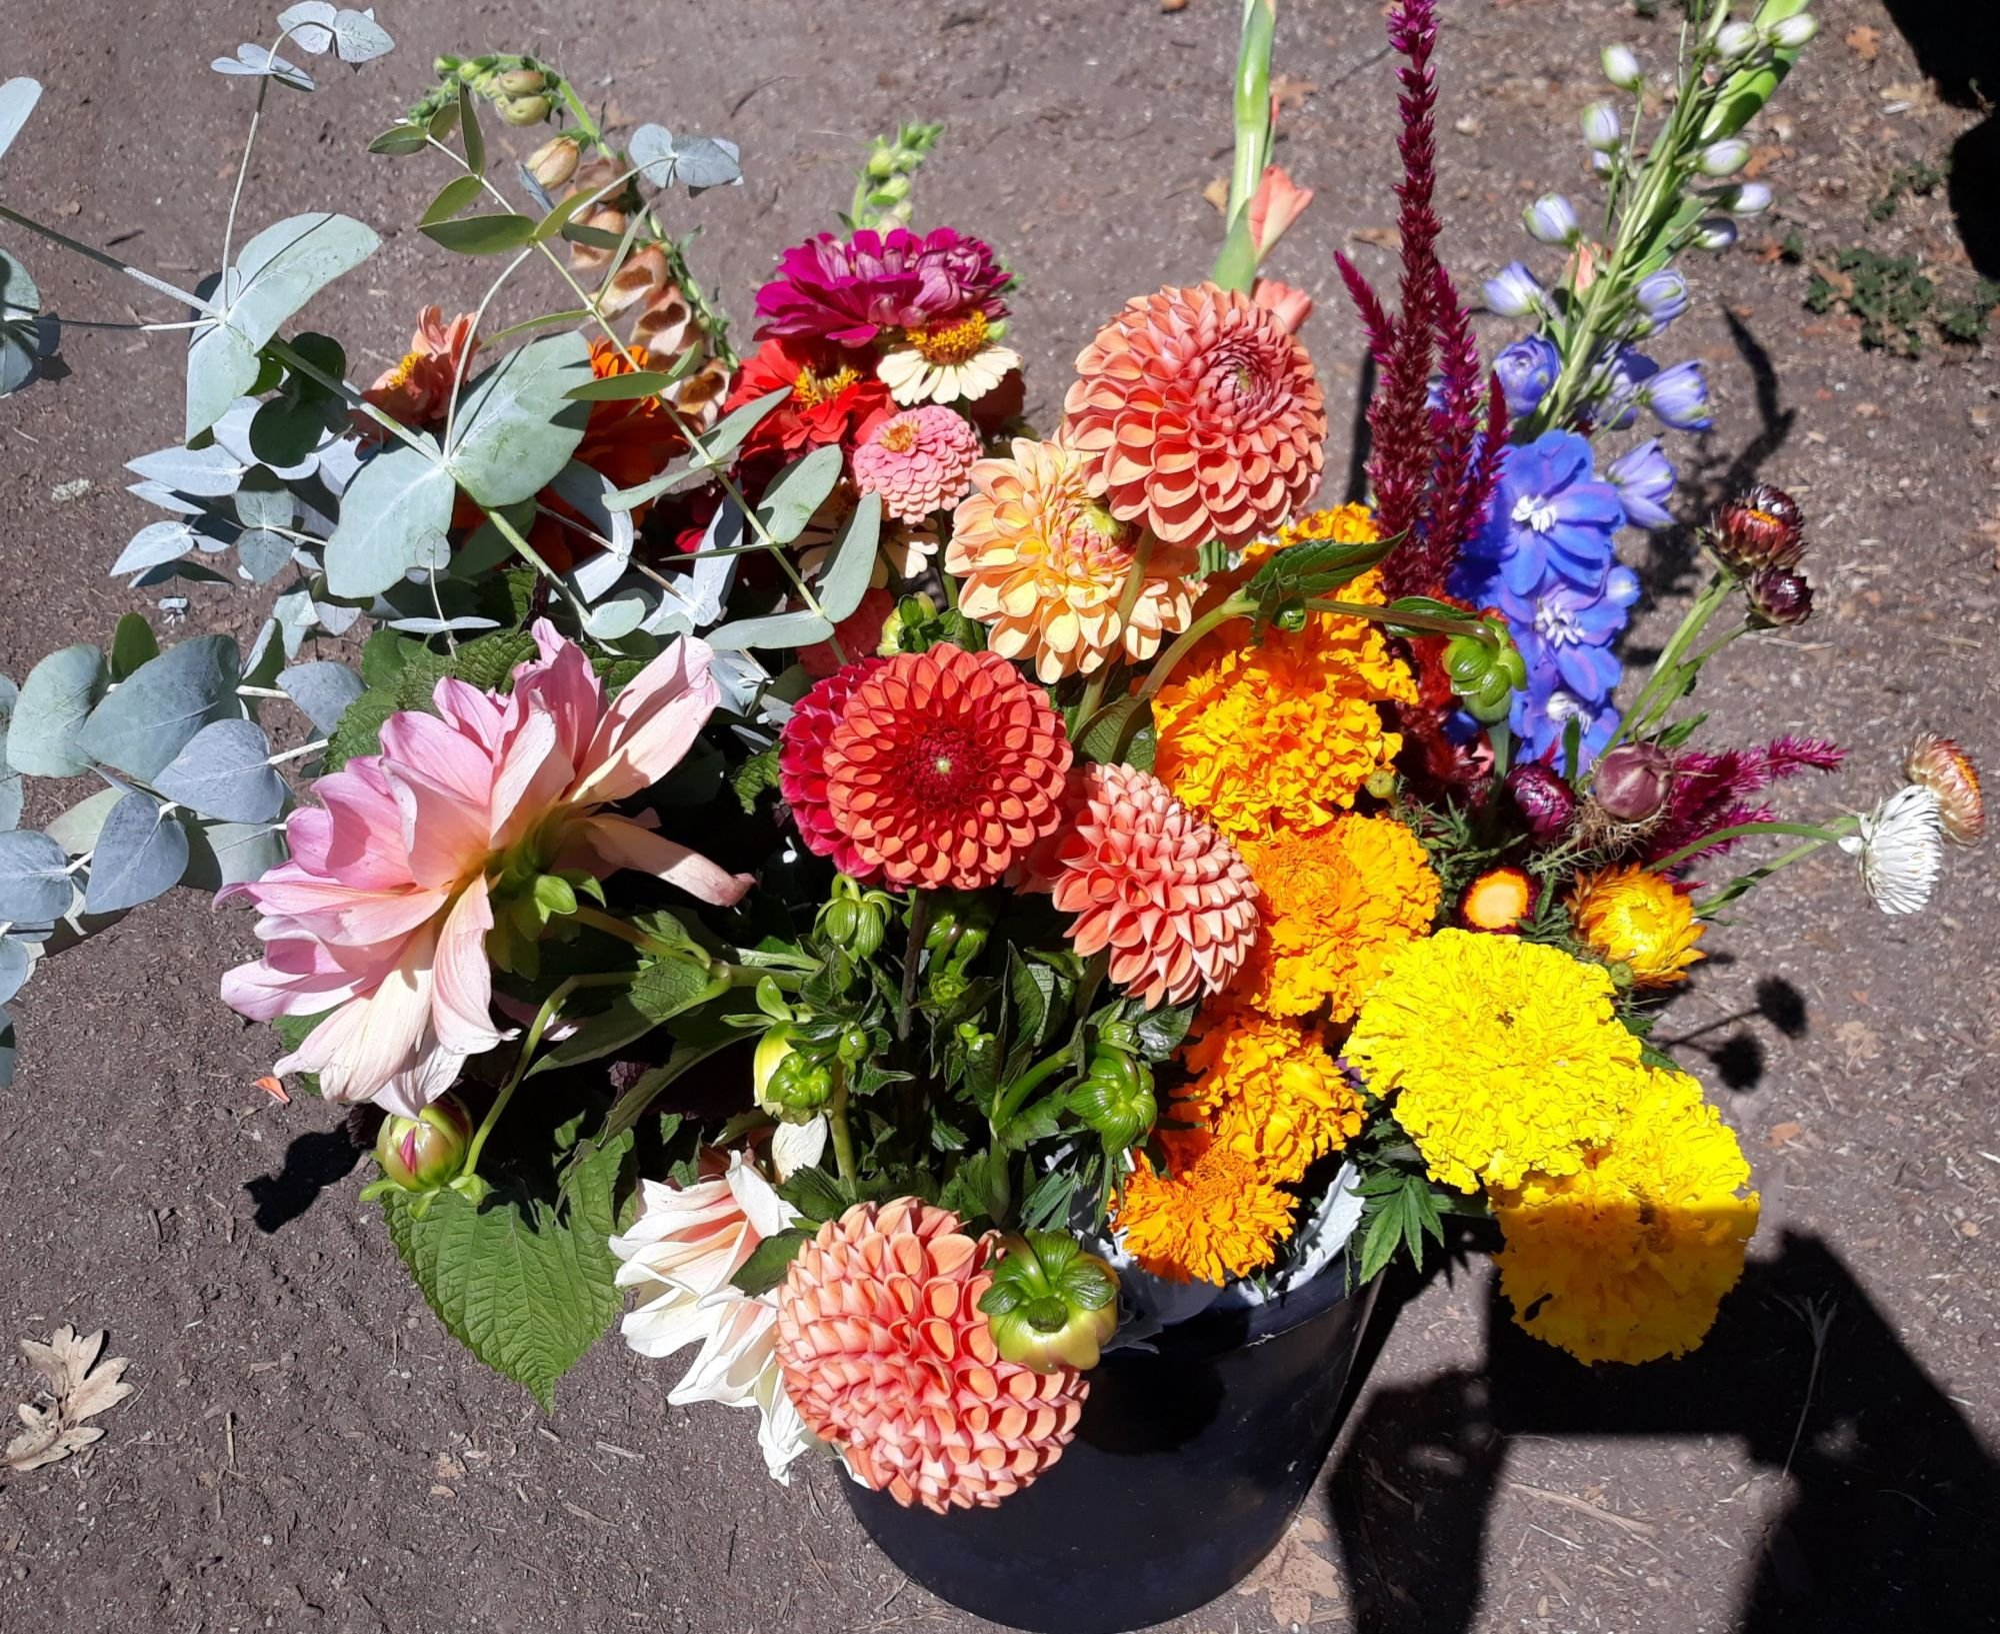 Flower Csa Ashland Waterleaf Flower Farm Design Studio